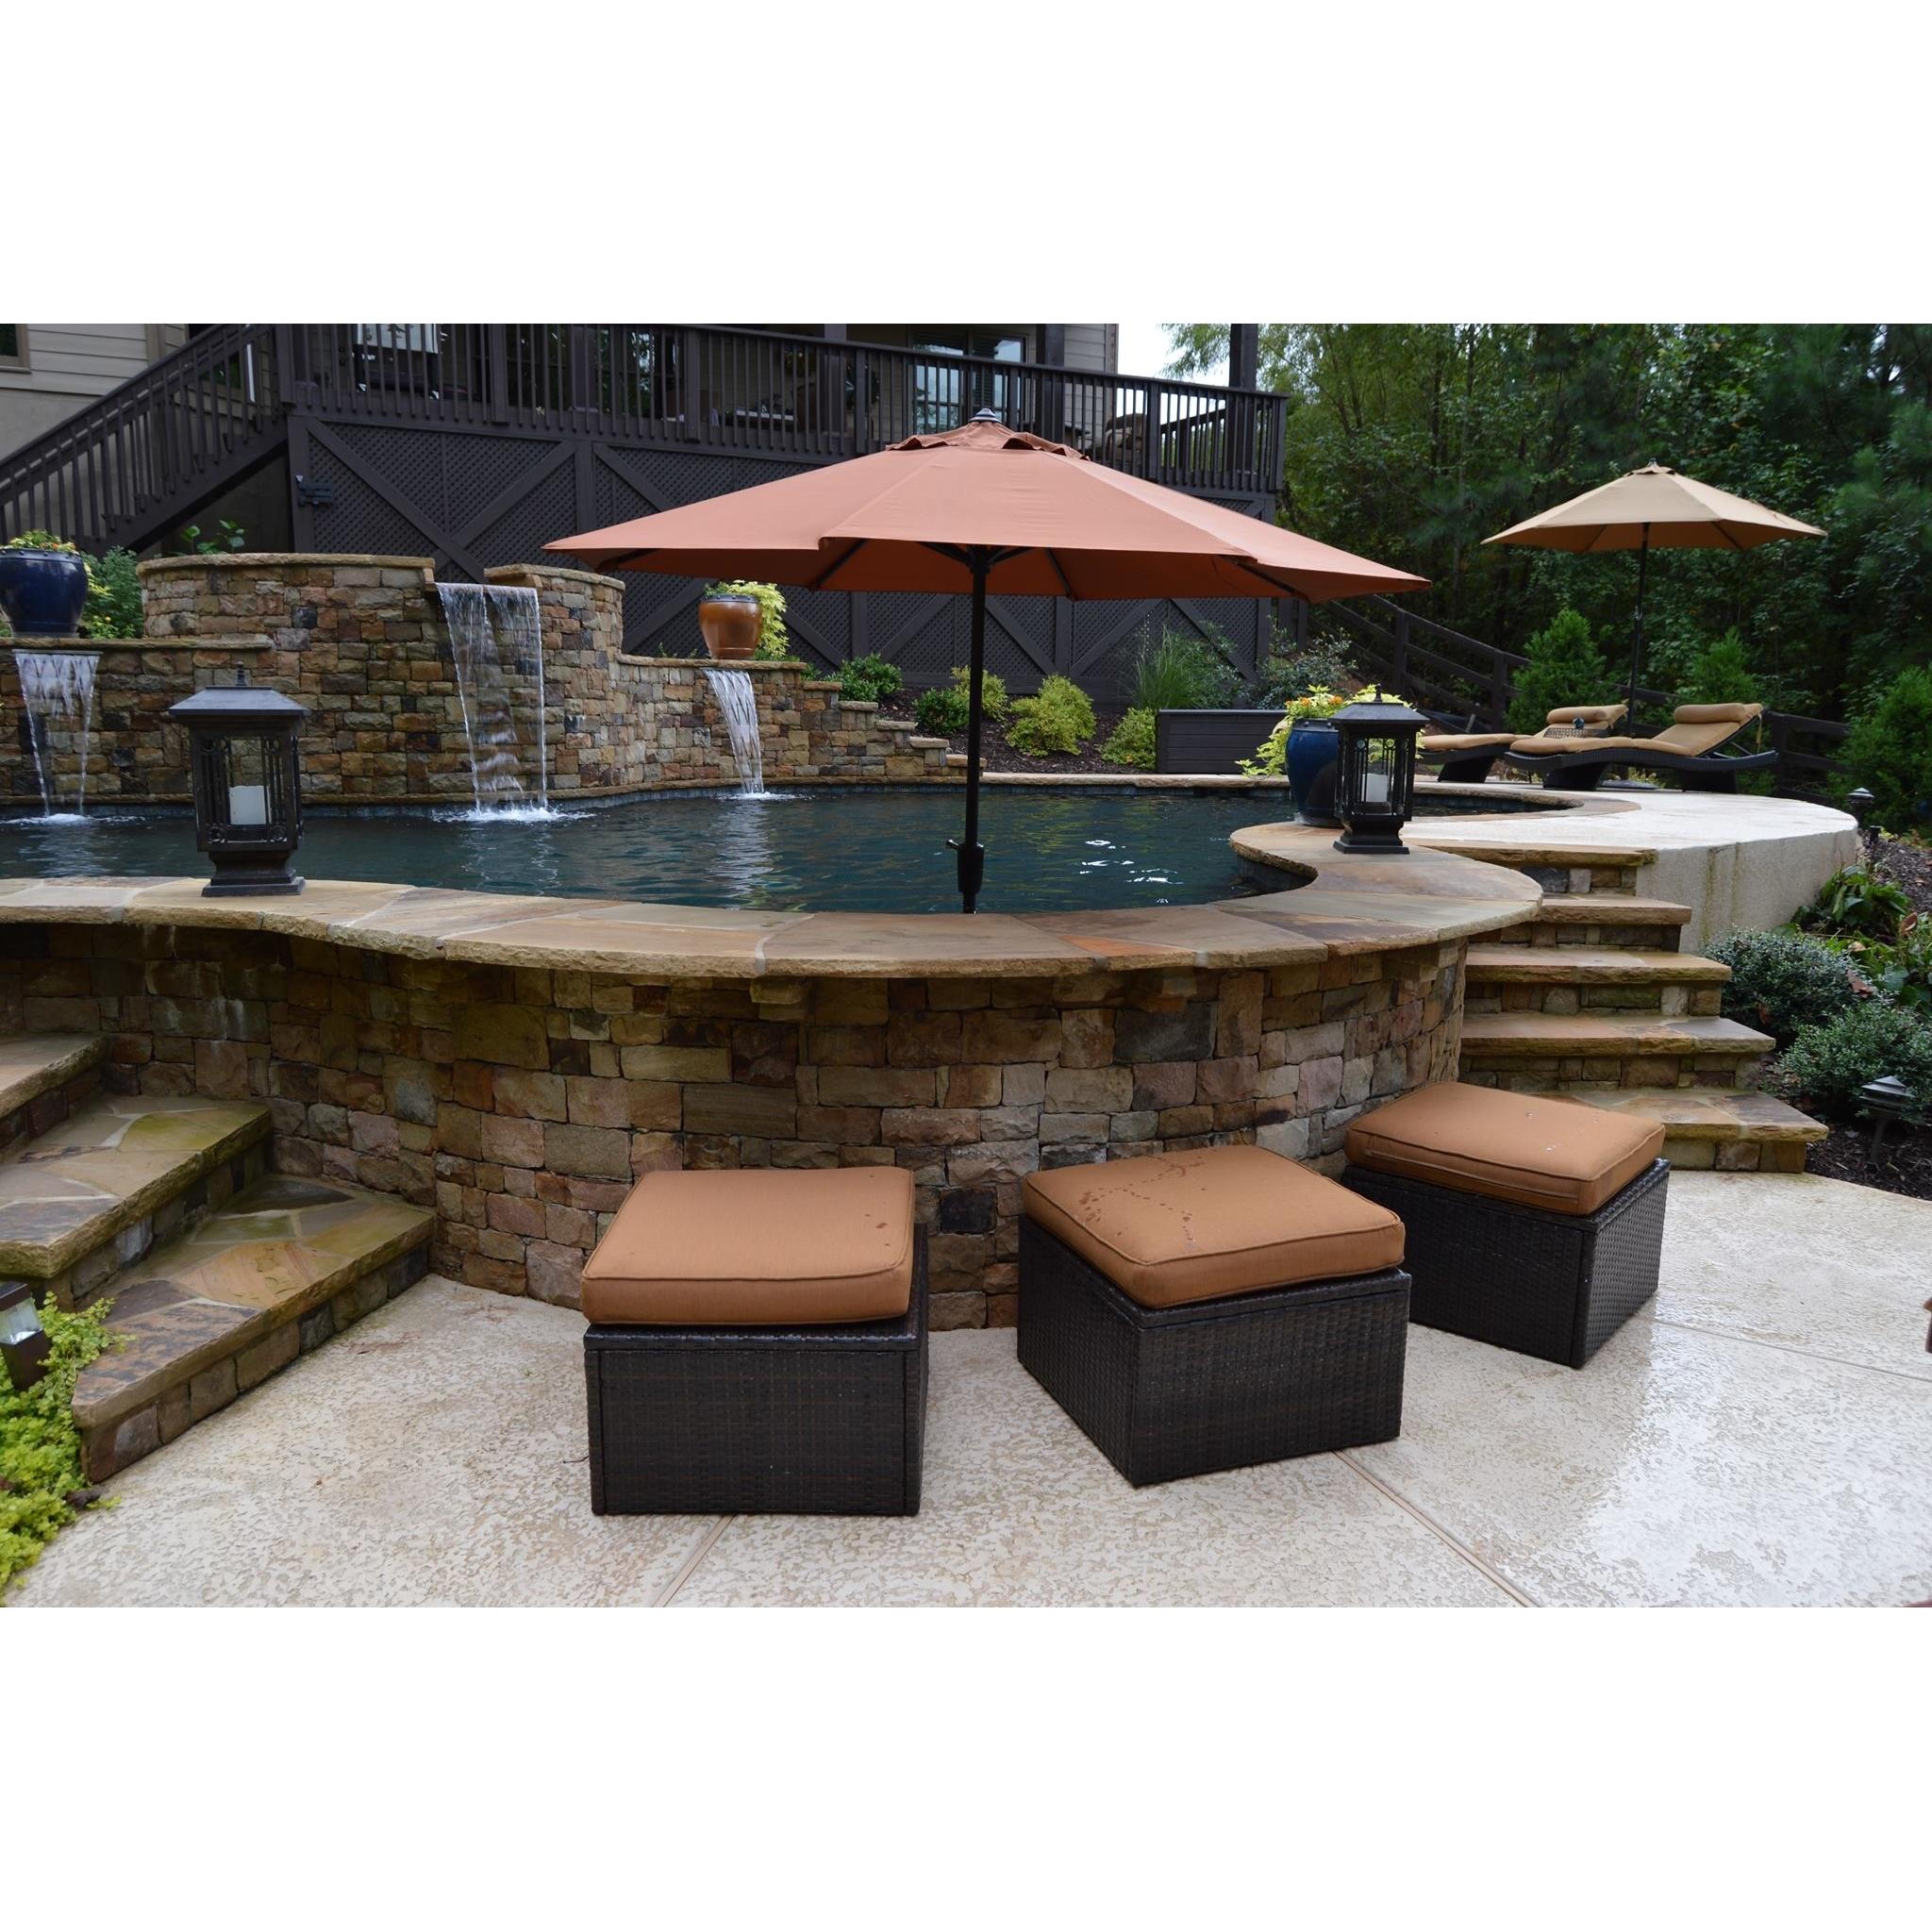 Hilltop Pools and Spas, Inc. - Jonesboro, GA - Swimming Pools & Spas